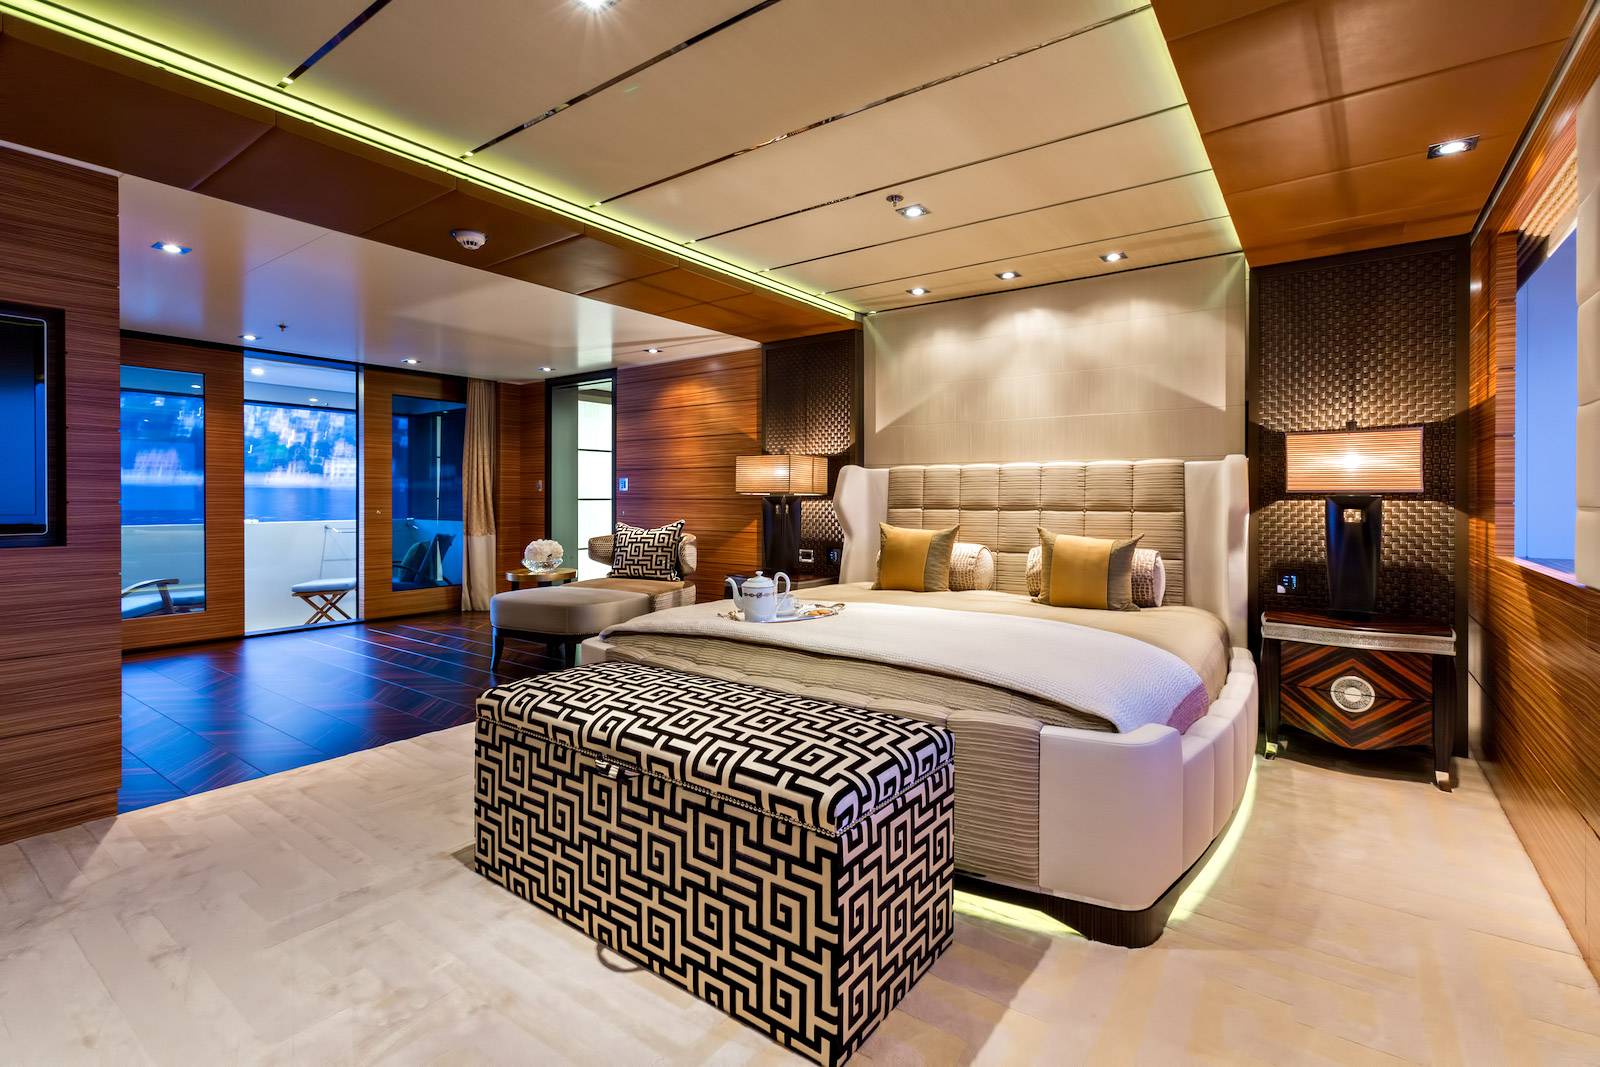 LARISA Superyacht - Dutch Built Quality and Spectacular Luxury Design